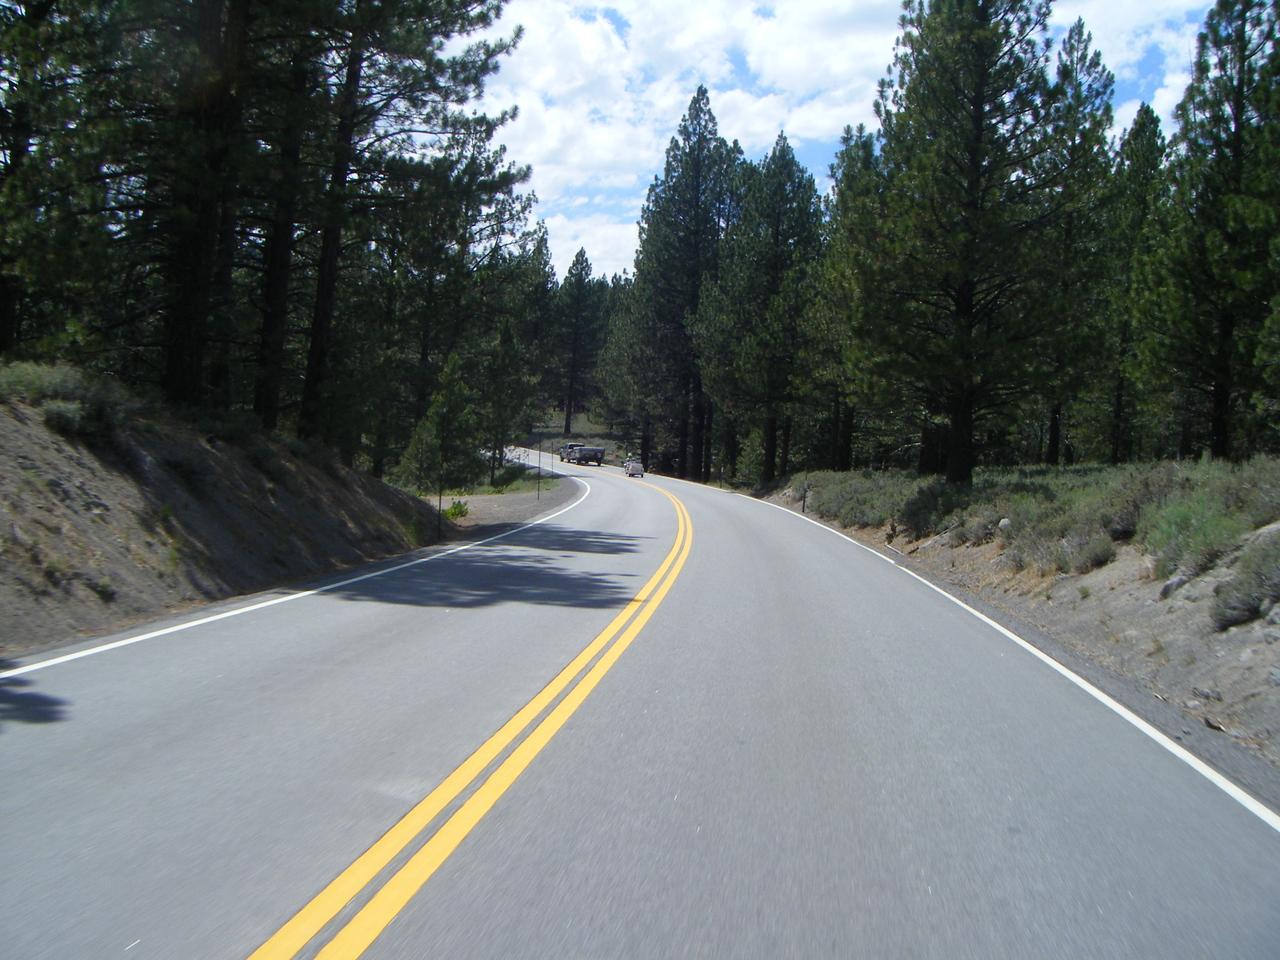 89 North of Tahoe